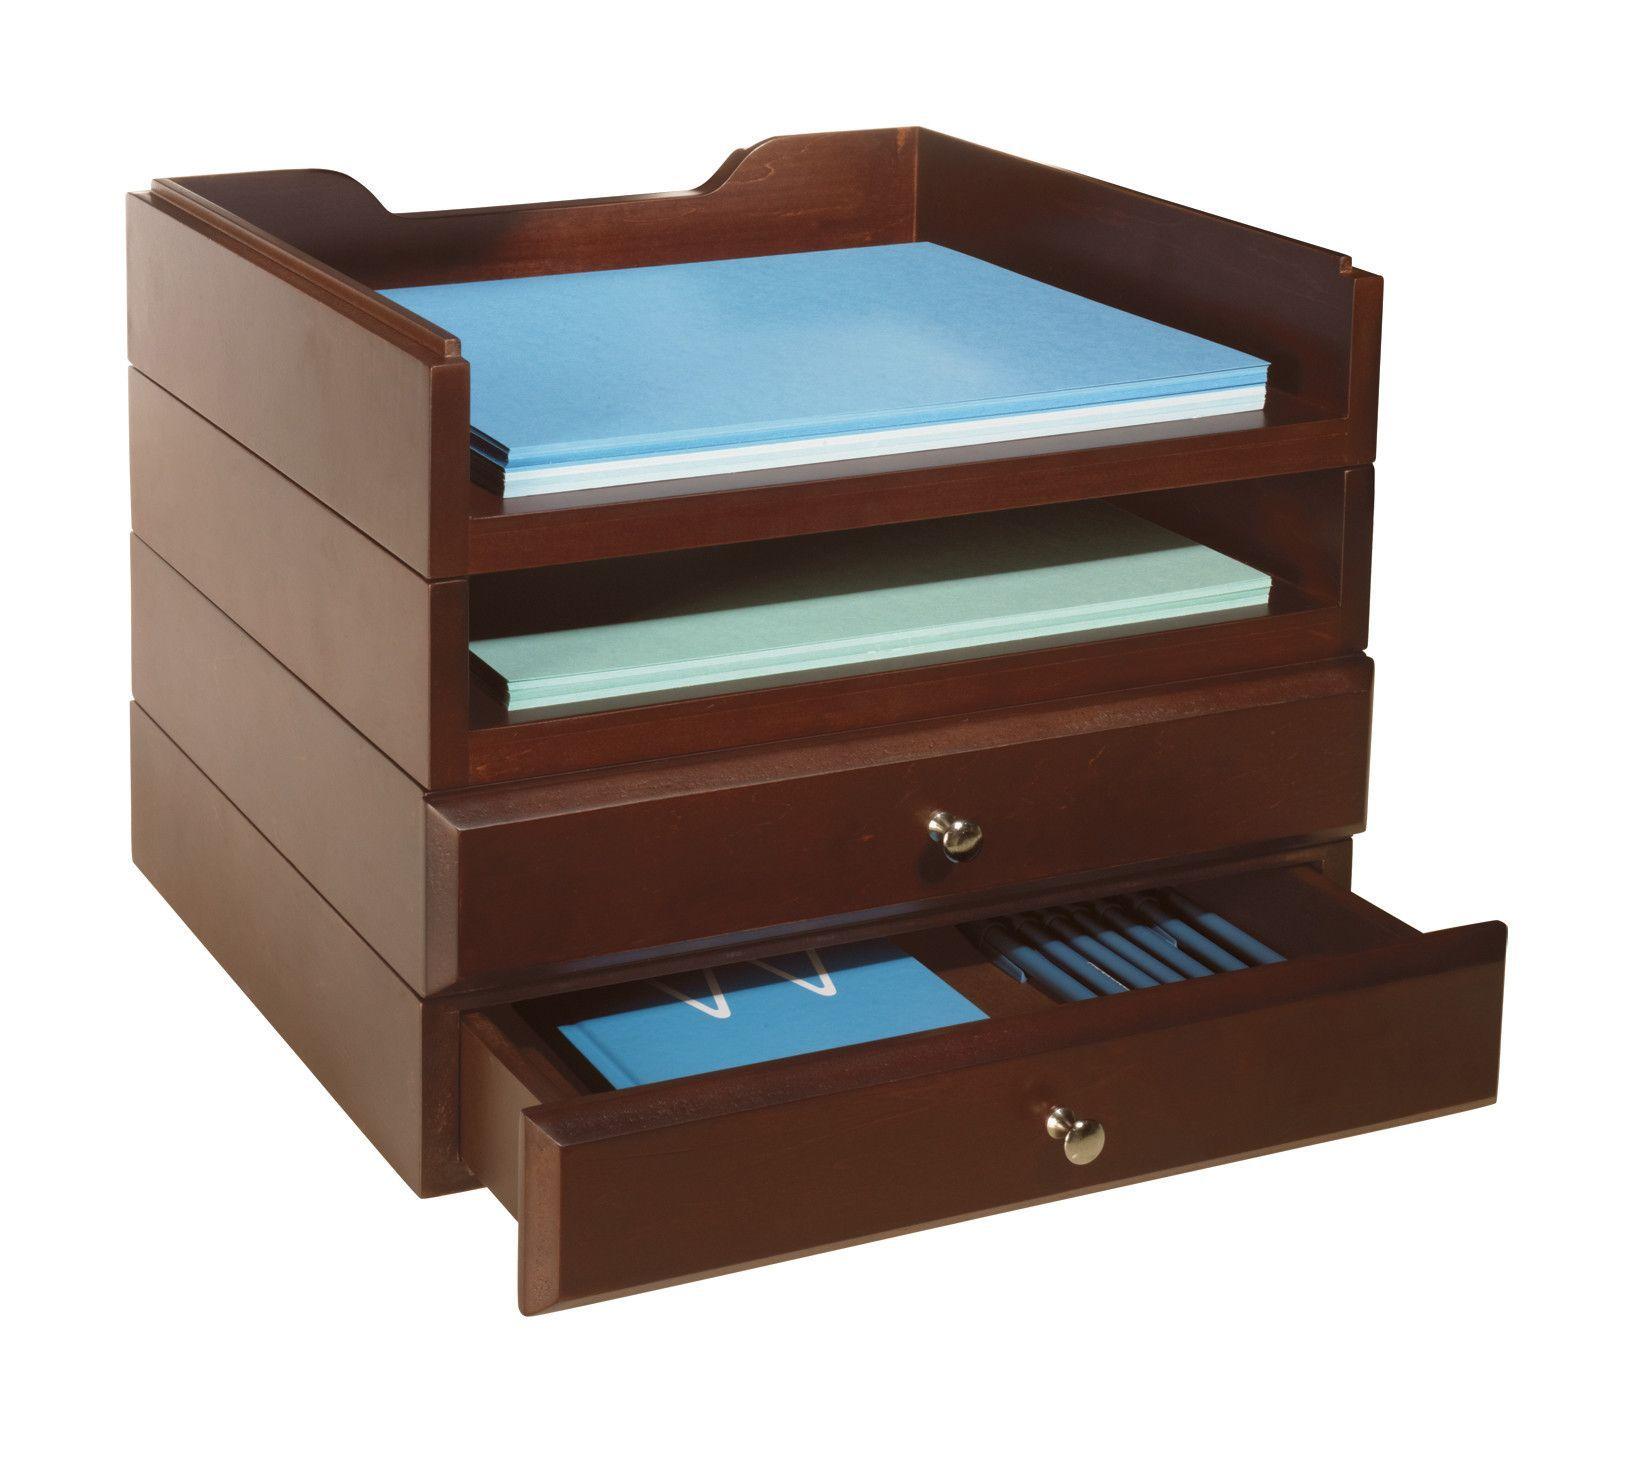 stacking wood desk organizers 2 tray u0026 2 drawer kit - Desk Organizer Tray